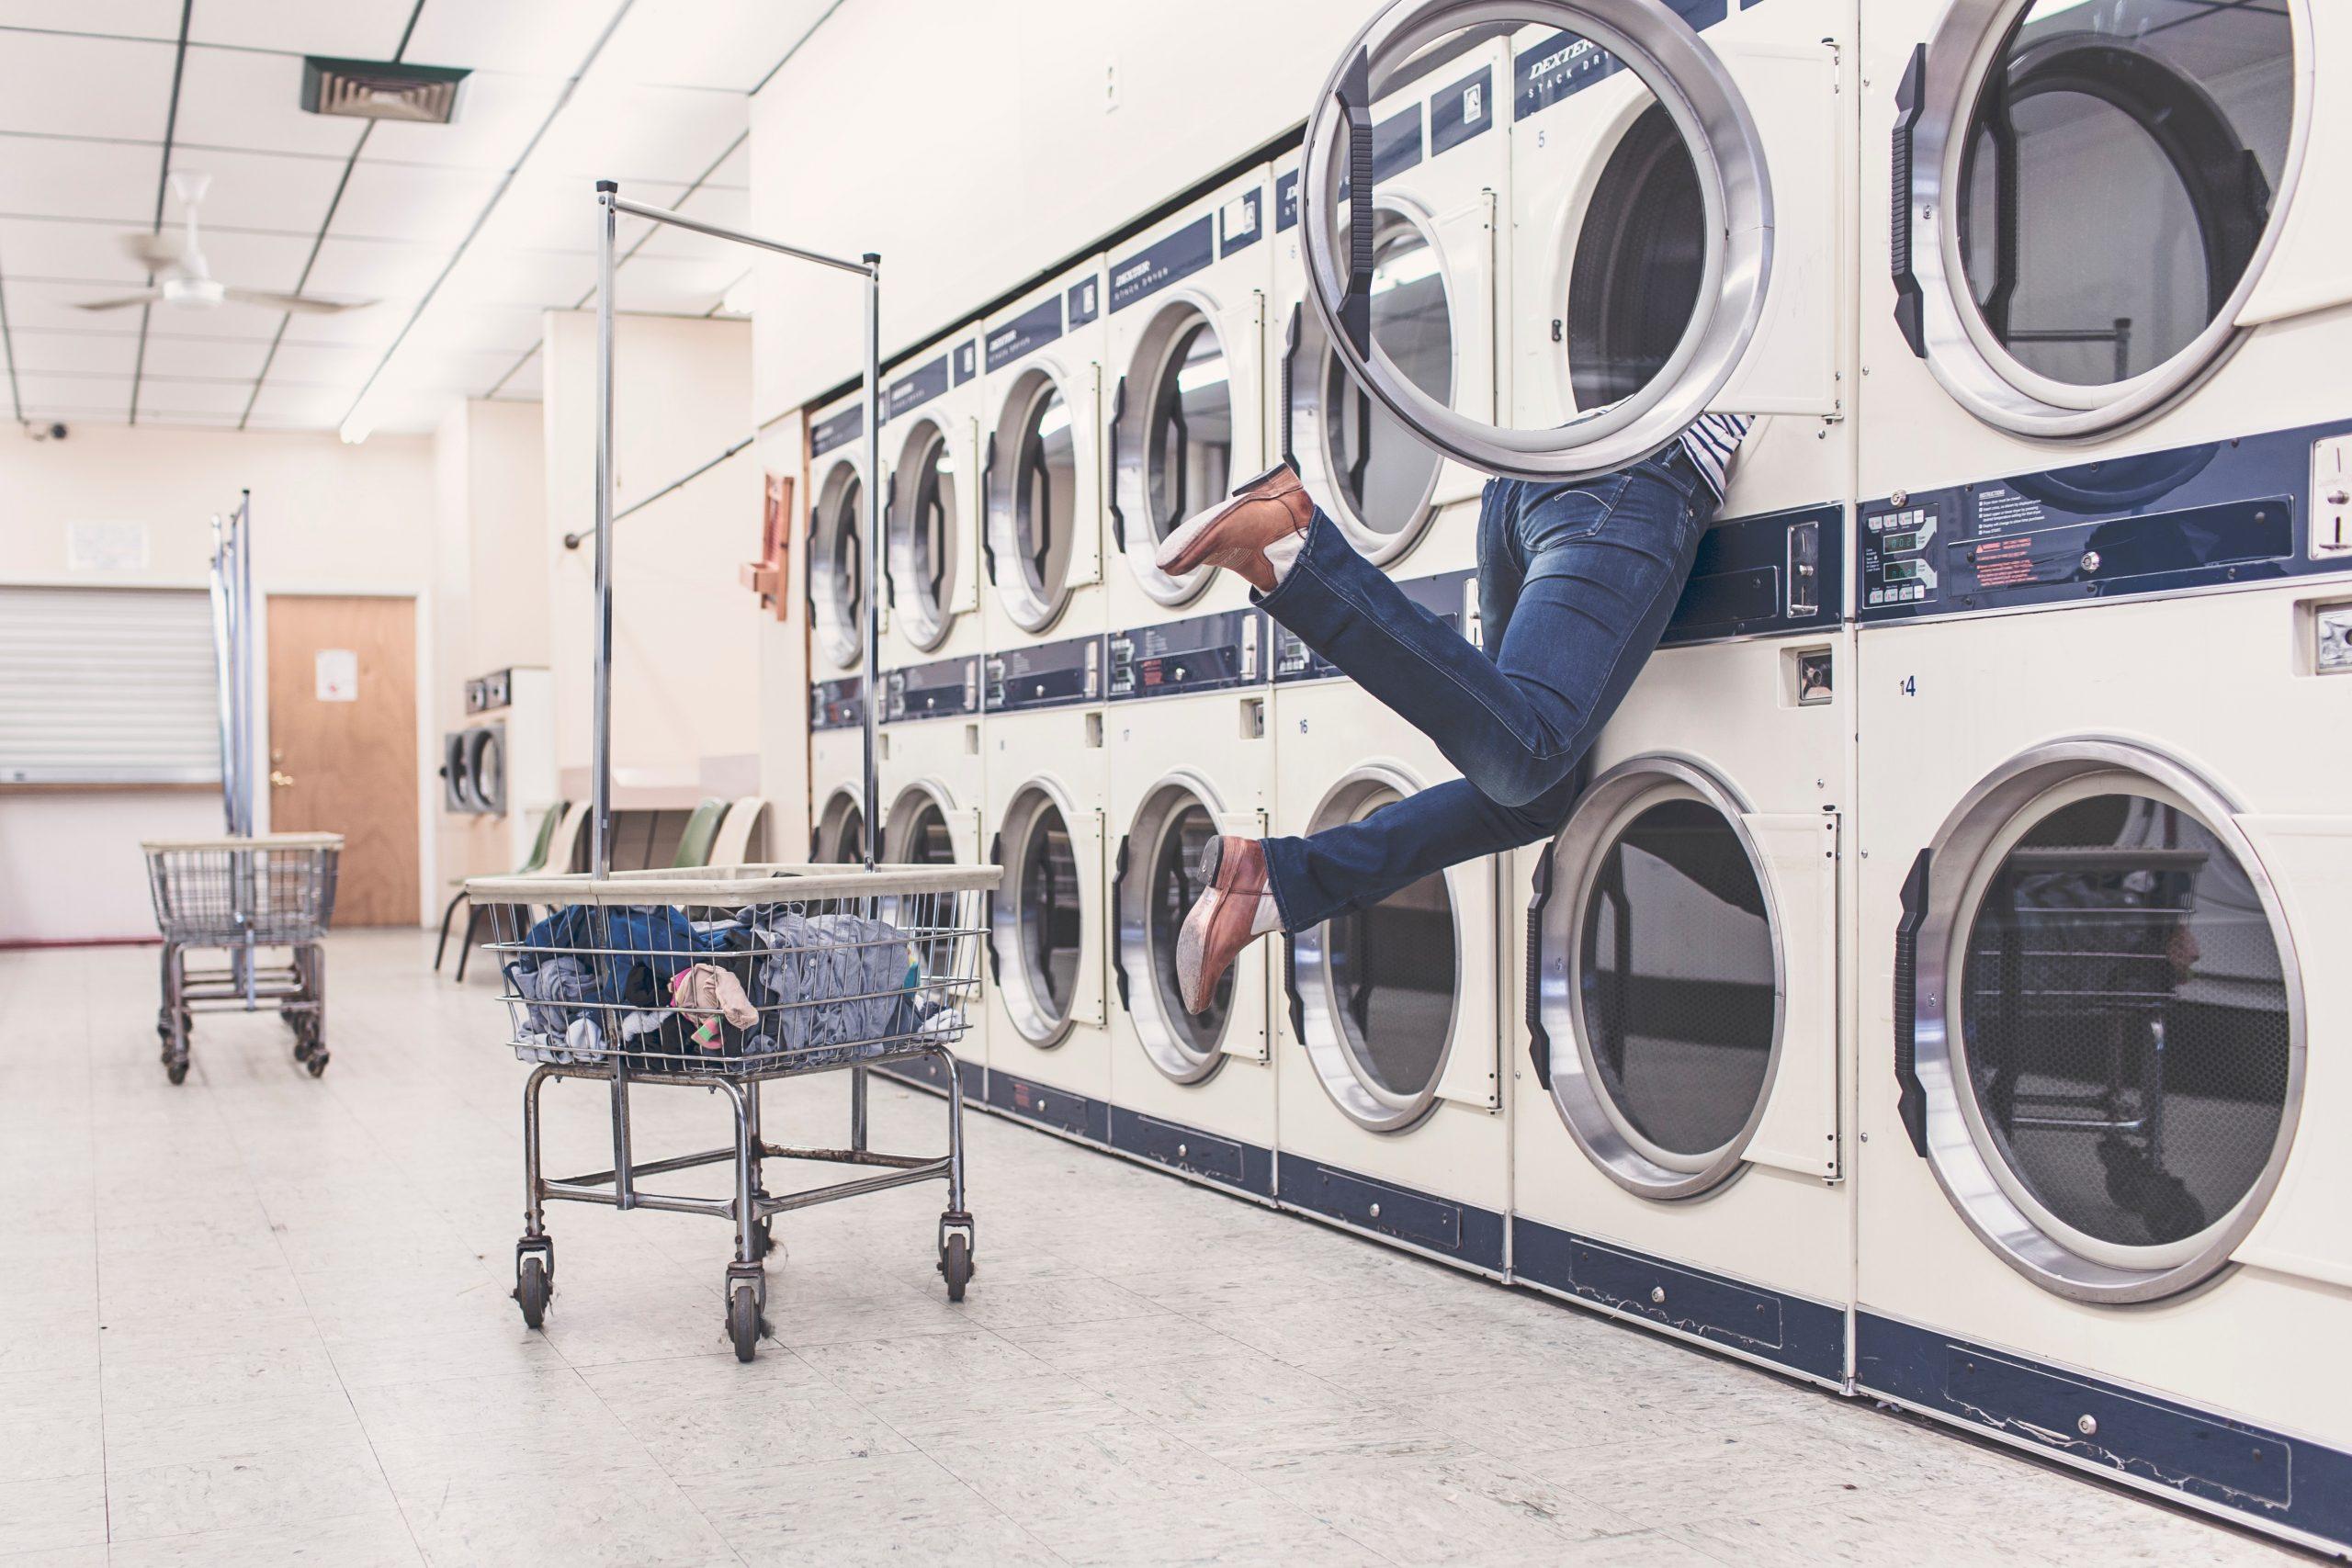 9 Wasfouten die je kleding kunnen ruïneren en hoe je dan wel moet wassen